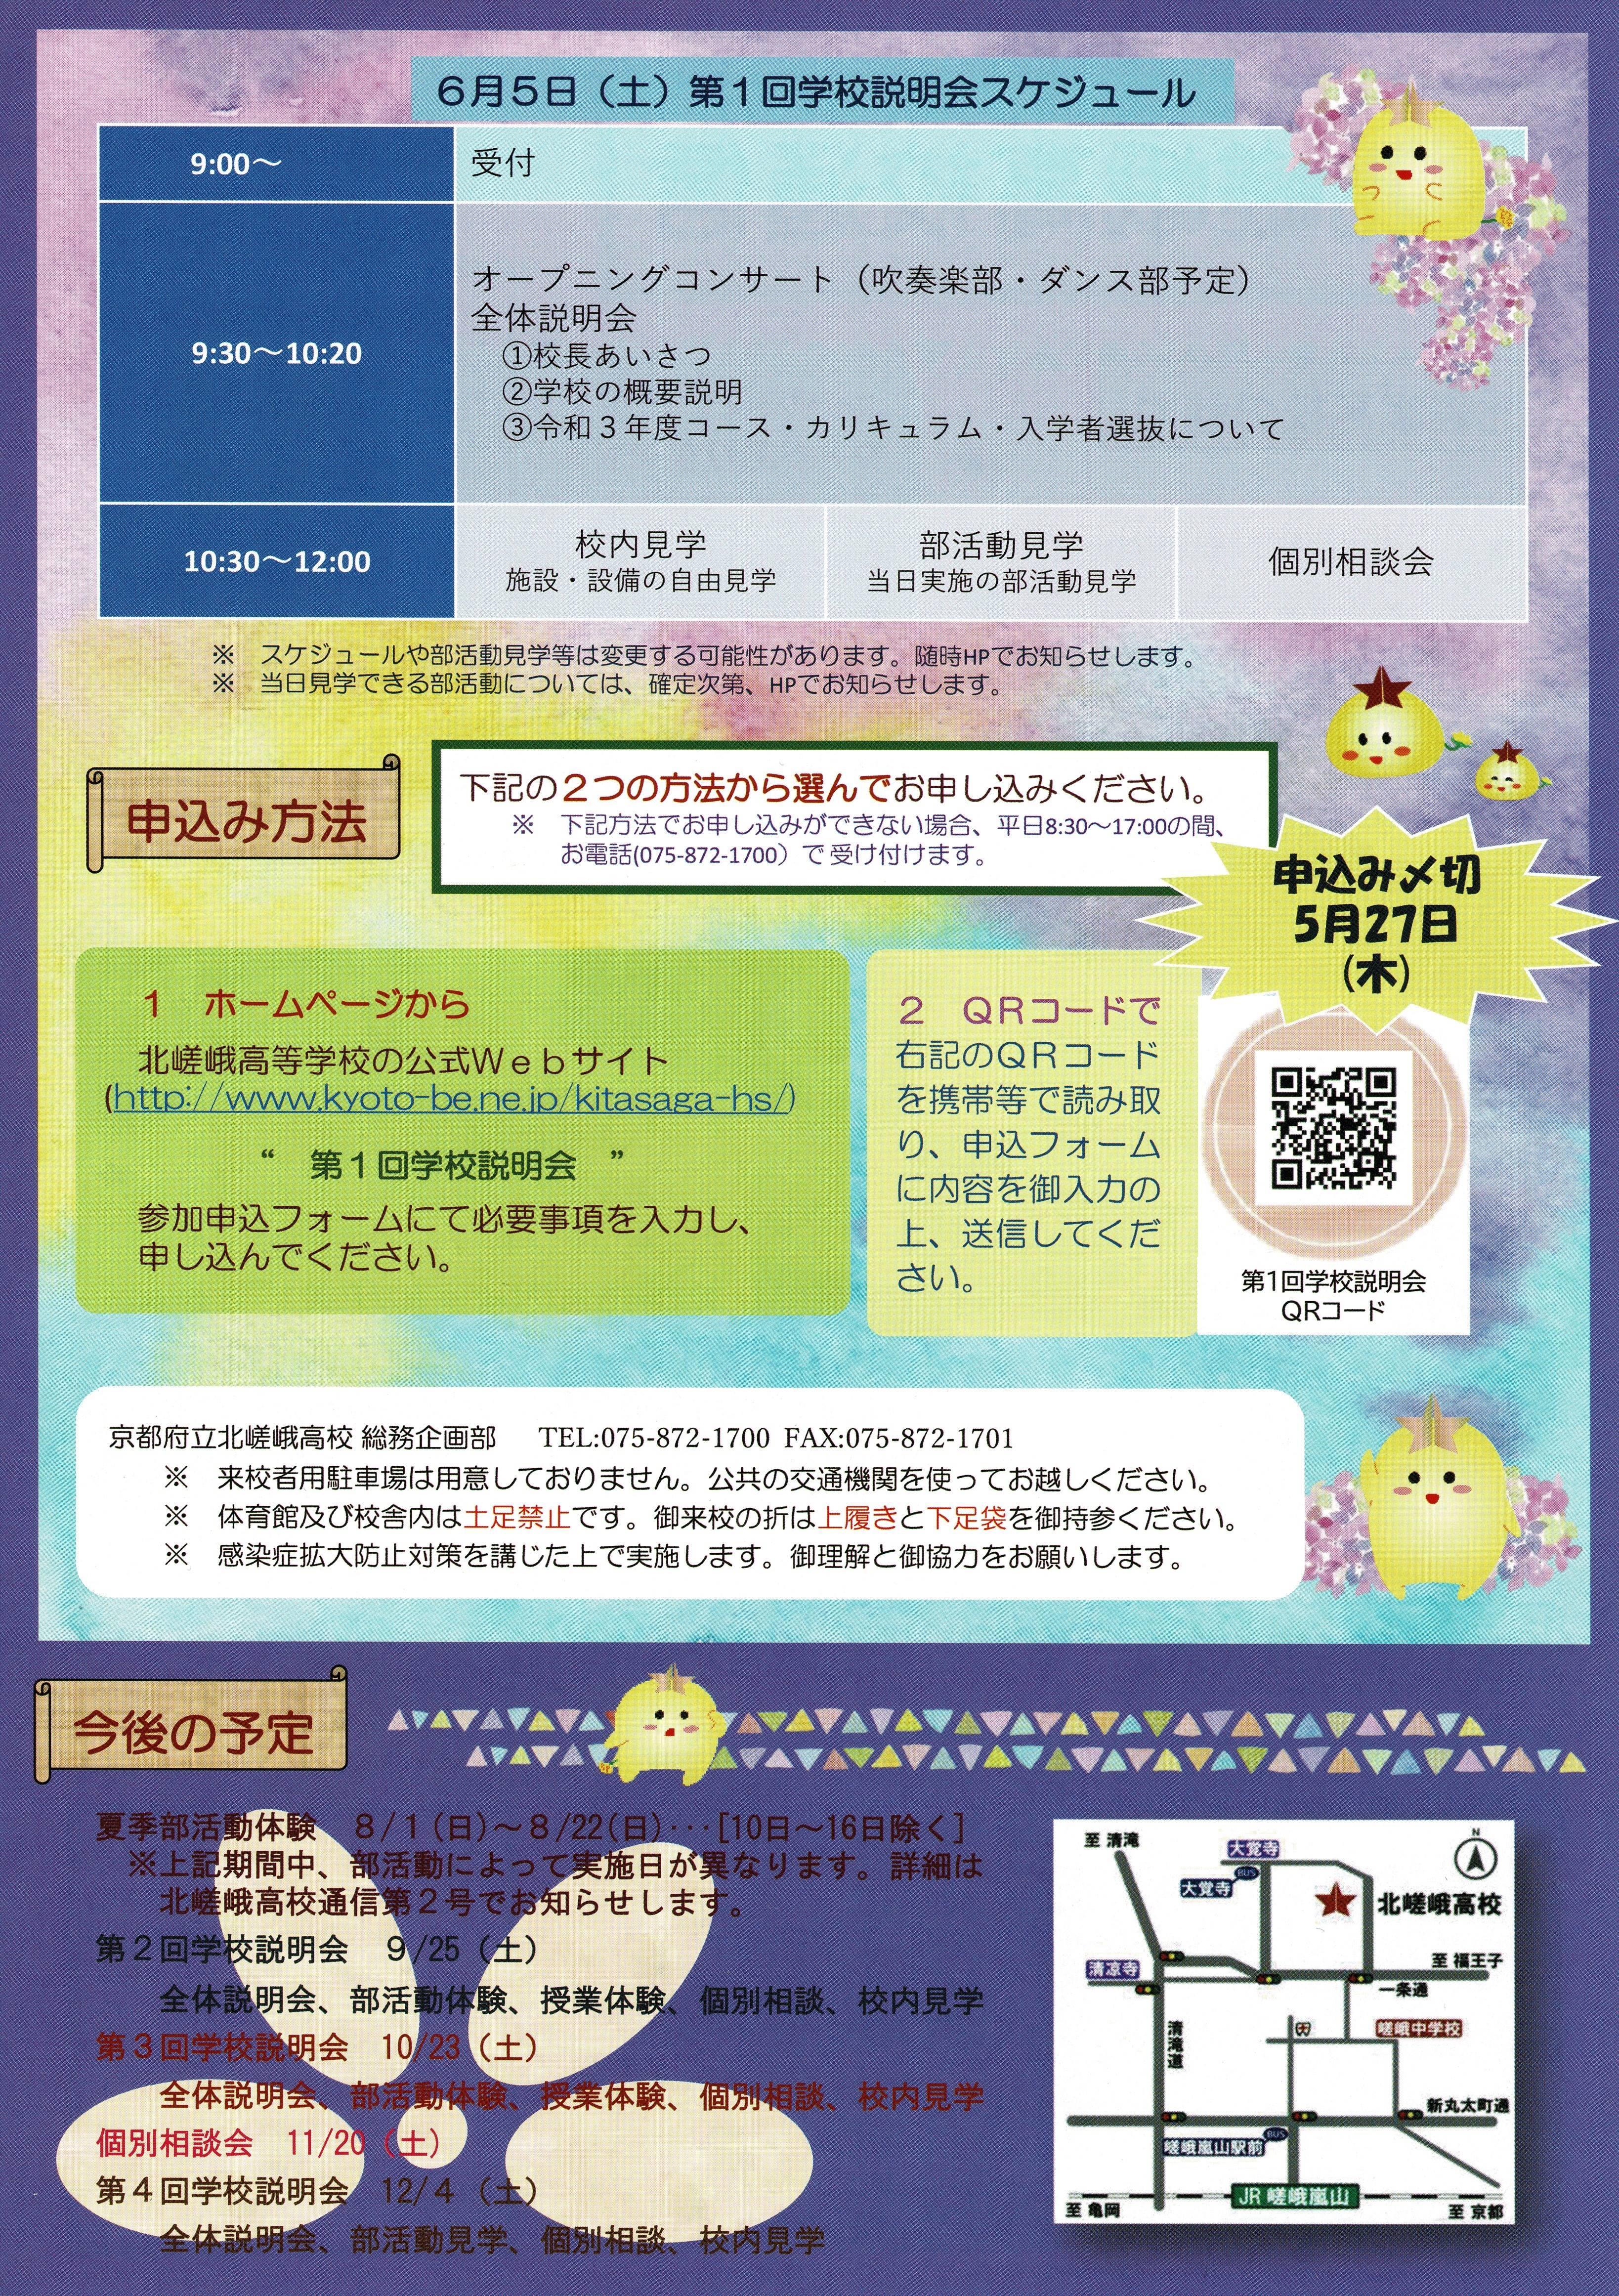 Scan2021-05-10_093157_001.jpg